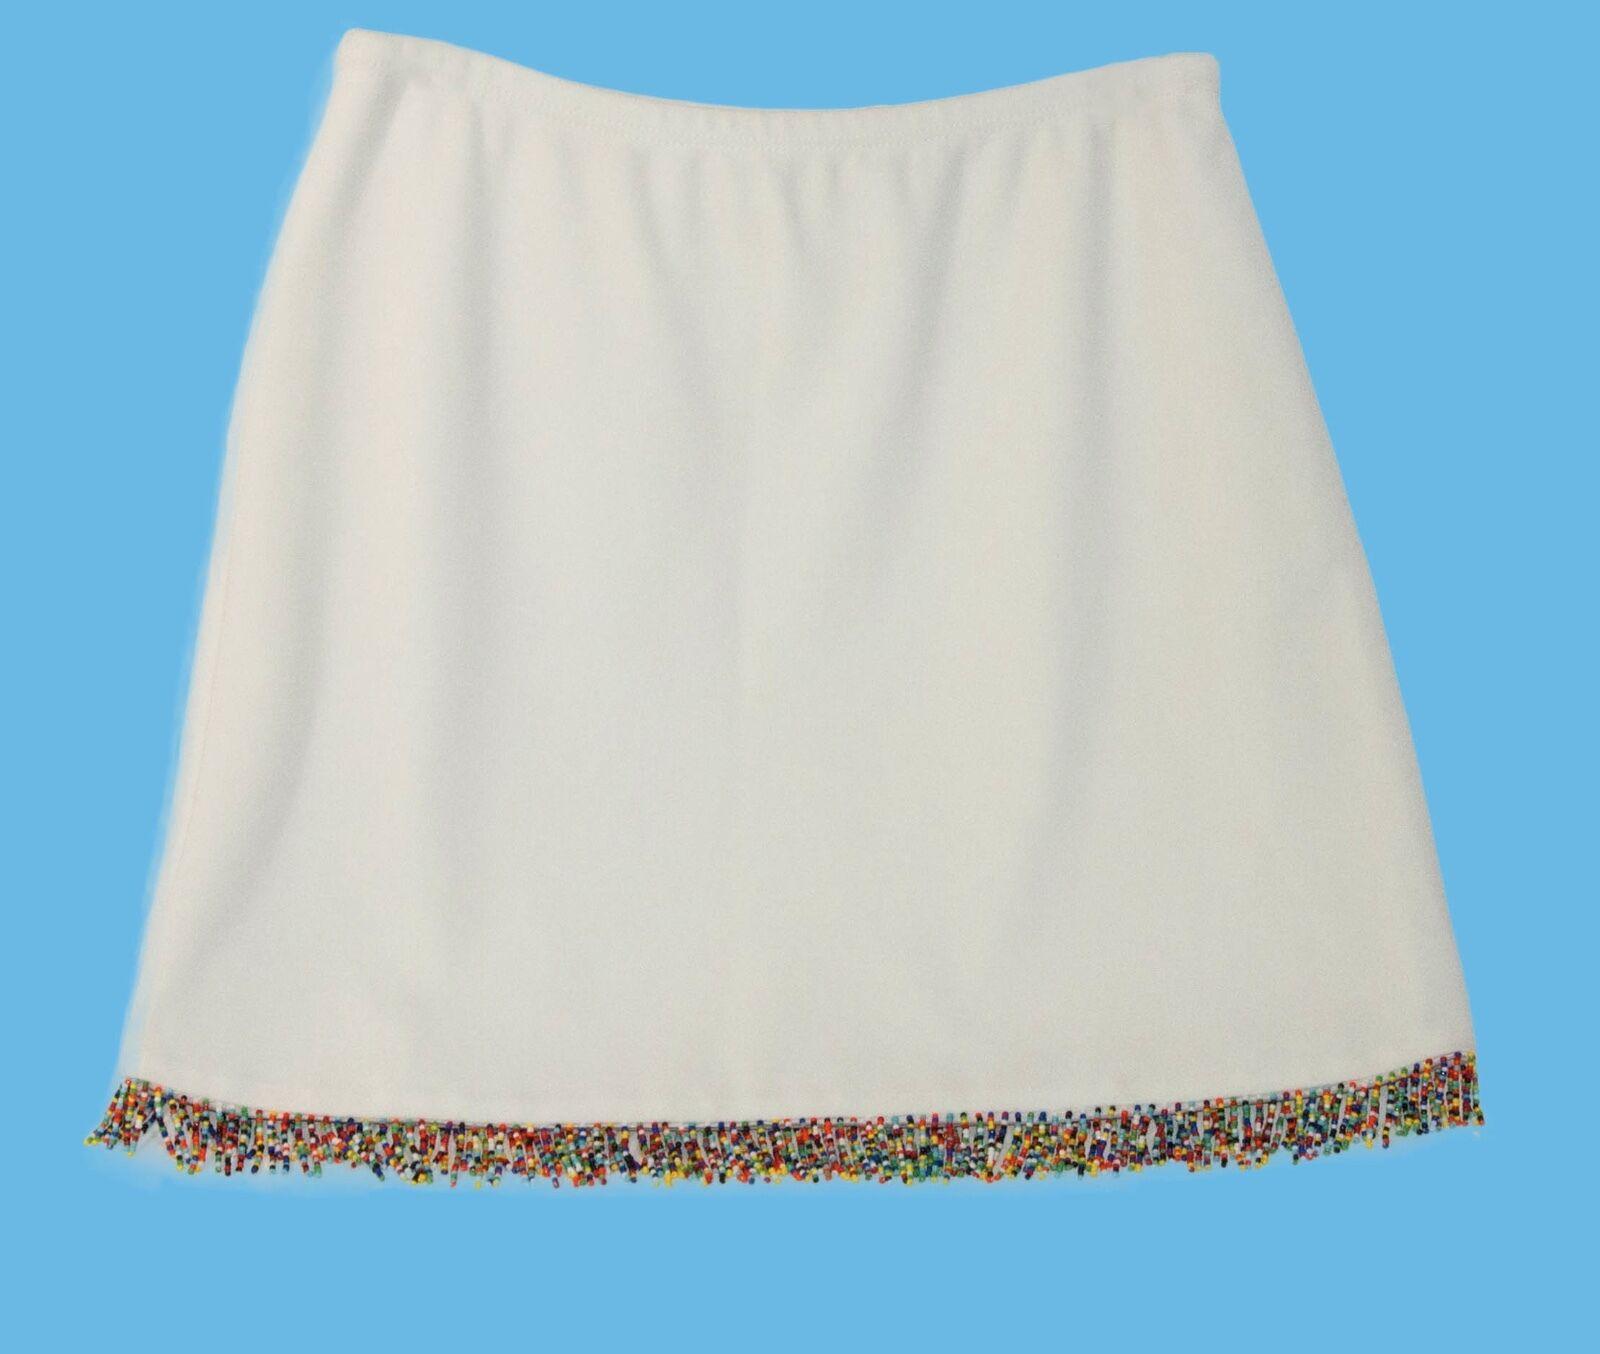 NWT CACHE White MINI SKIRT ELASTIC WAIST w mult-color BEADED TRIM  Size M